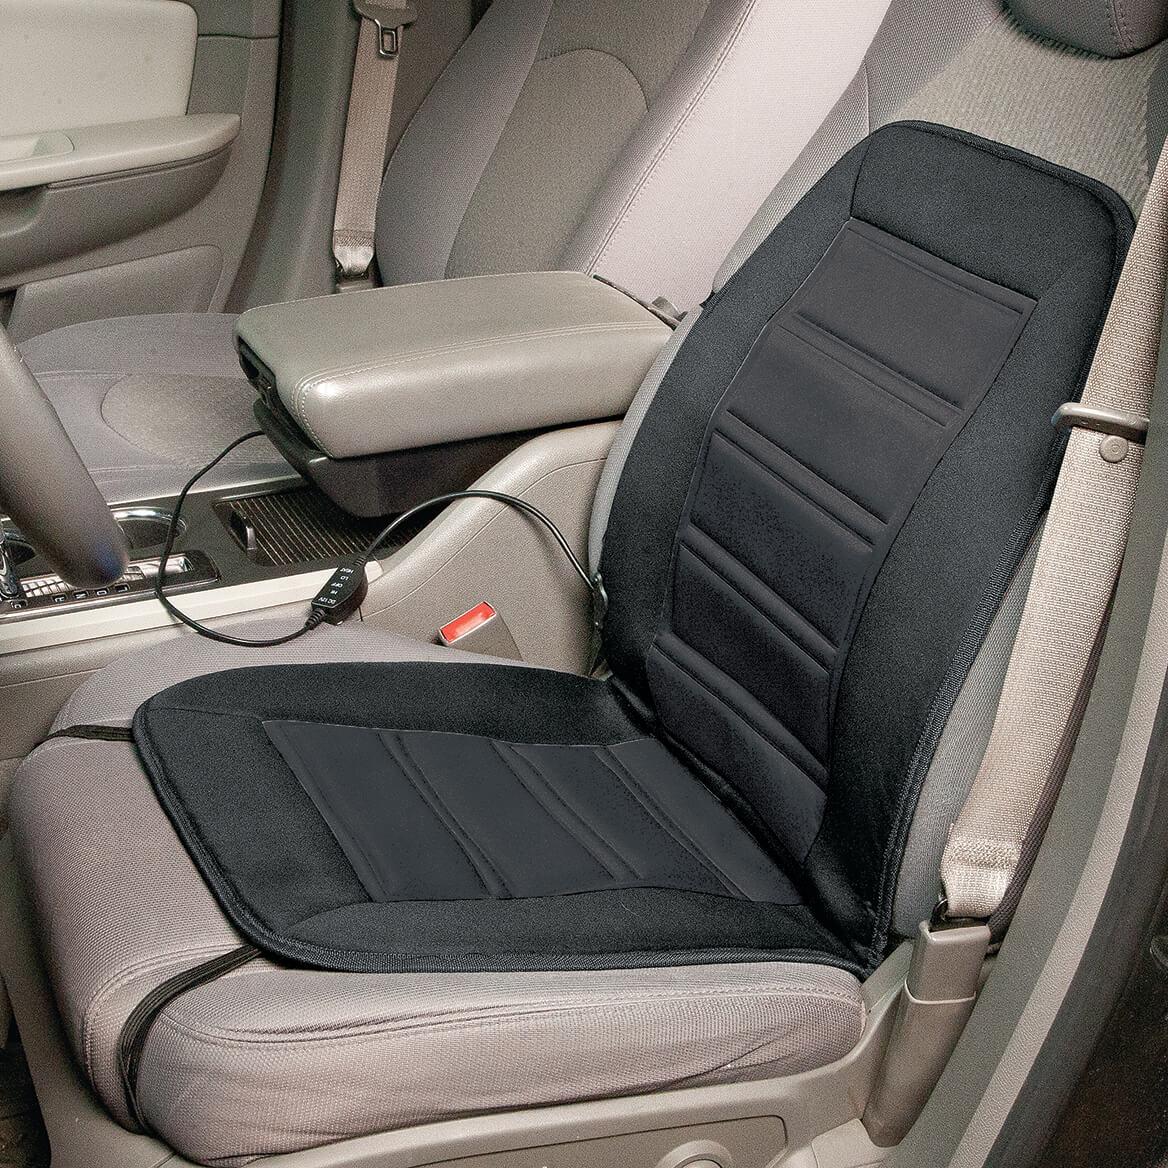 heated auto seat cushion car seat cushion miles kimball. Black Bedroom Furniture Sets. Home Design Ideas